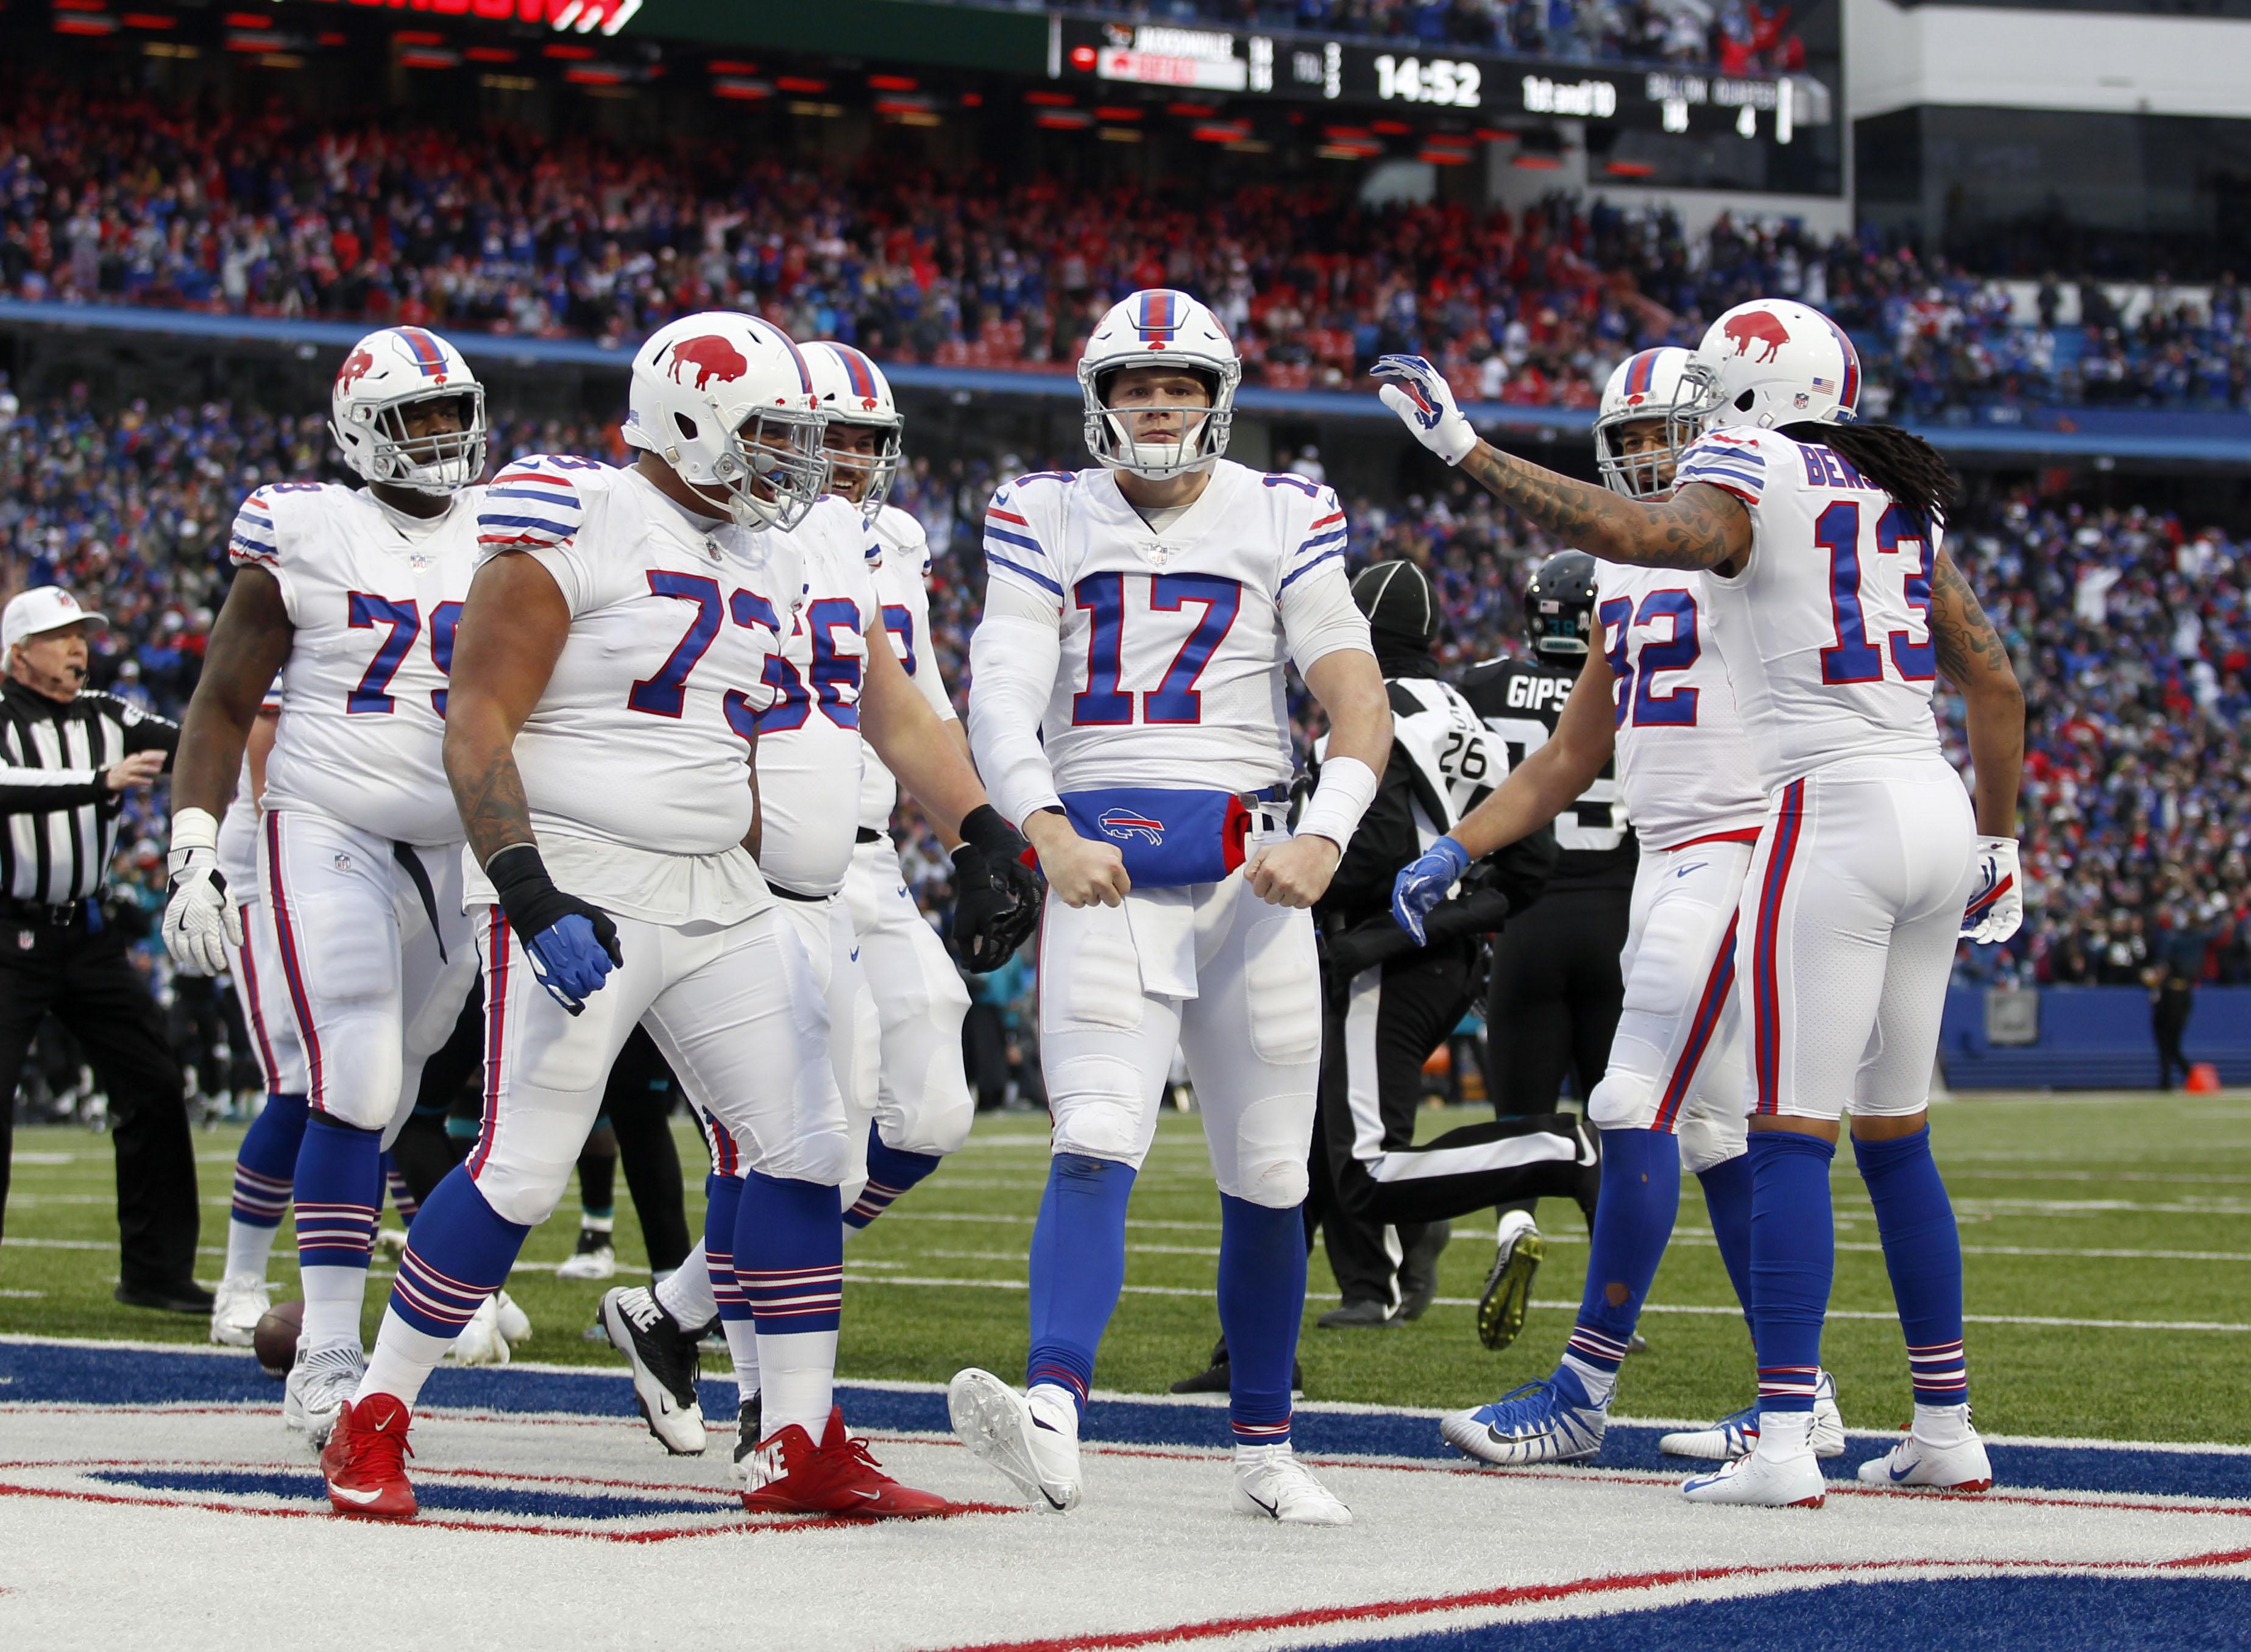 NFL: Jacksonville Jaguars at Buffalo Bills